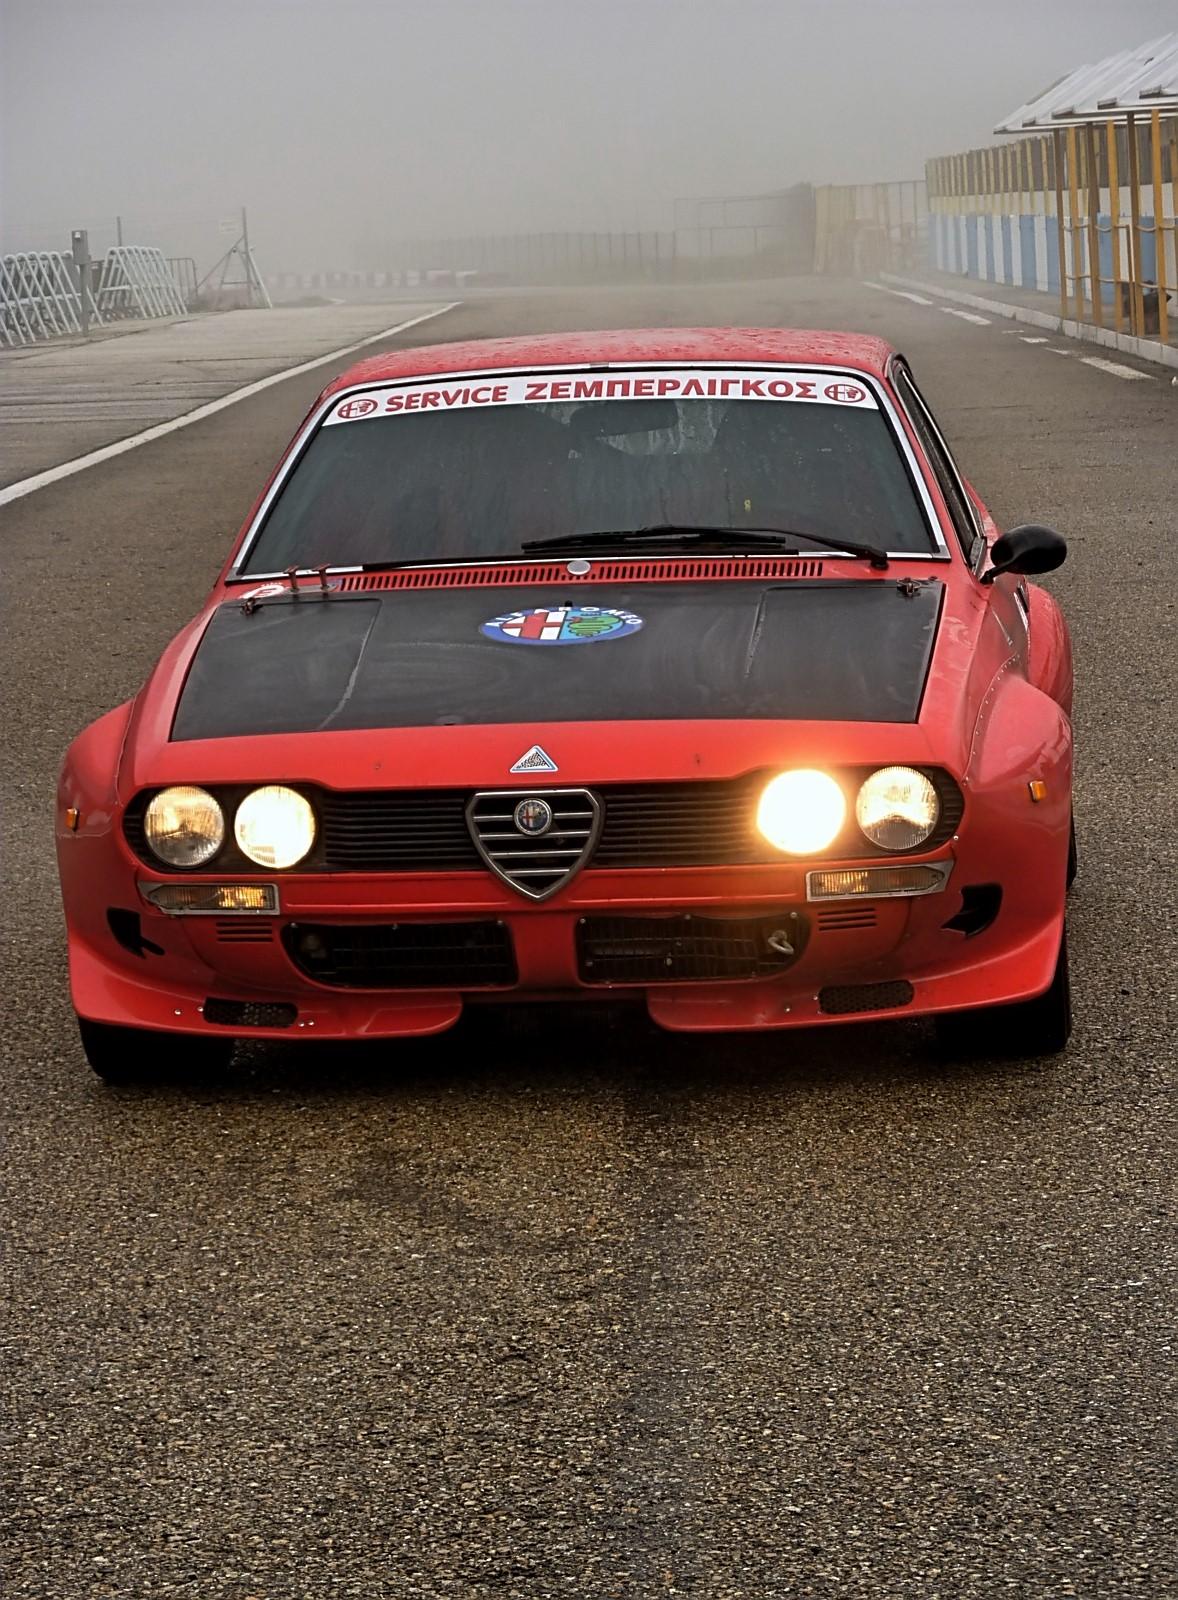 1974 Alfa Romeo Alfetta GT 1800 Group 2 (34)